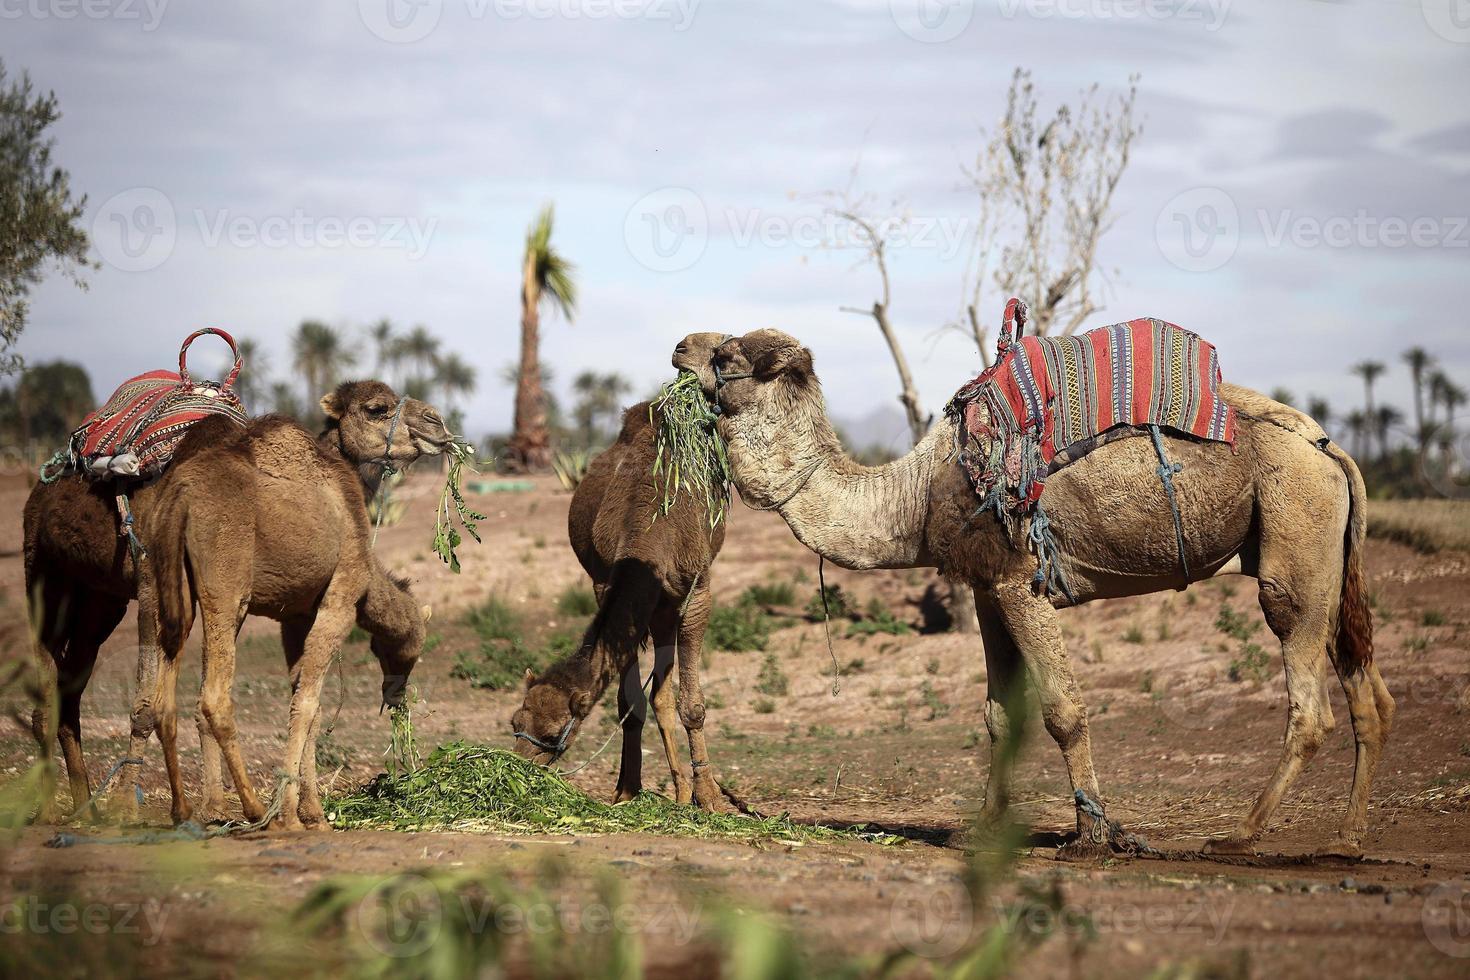 Dromedaries in the West Sahara photo